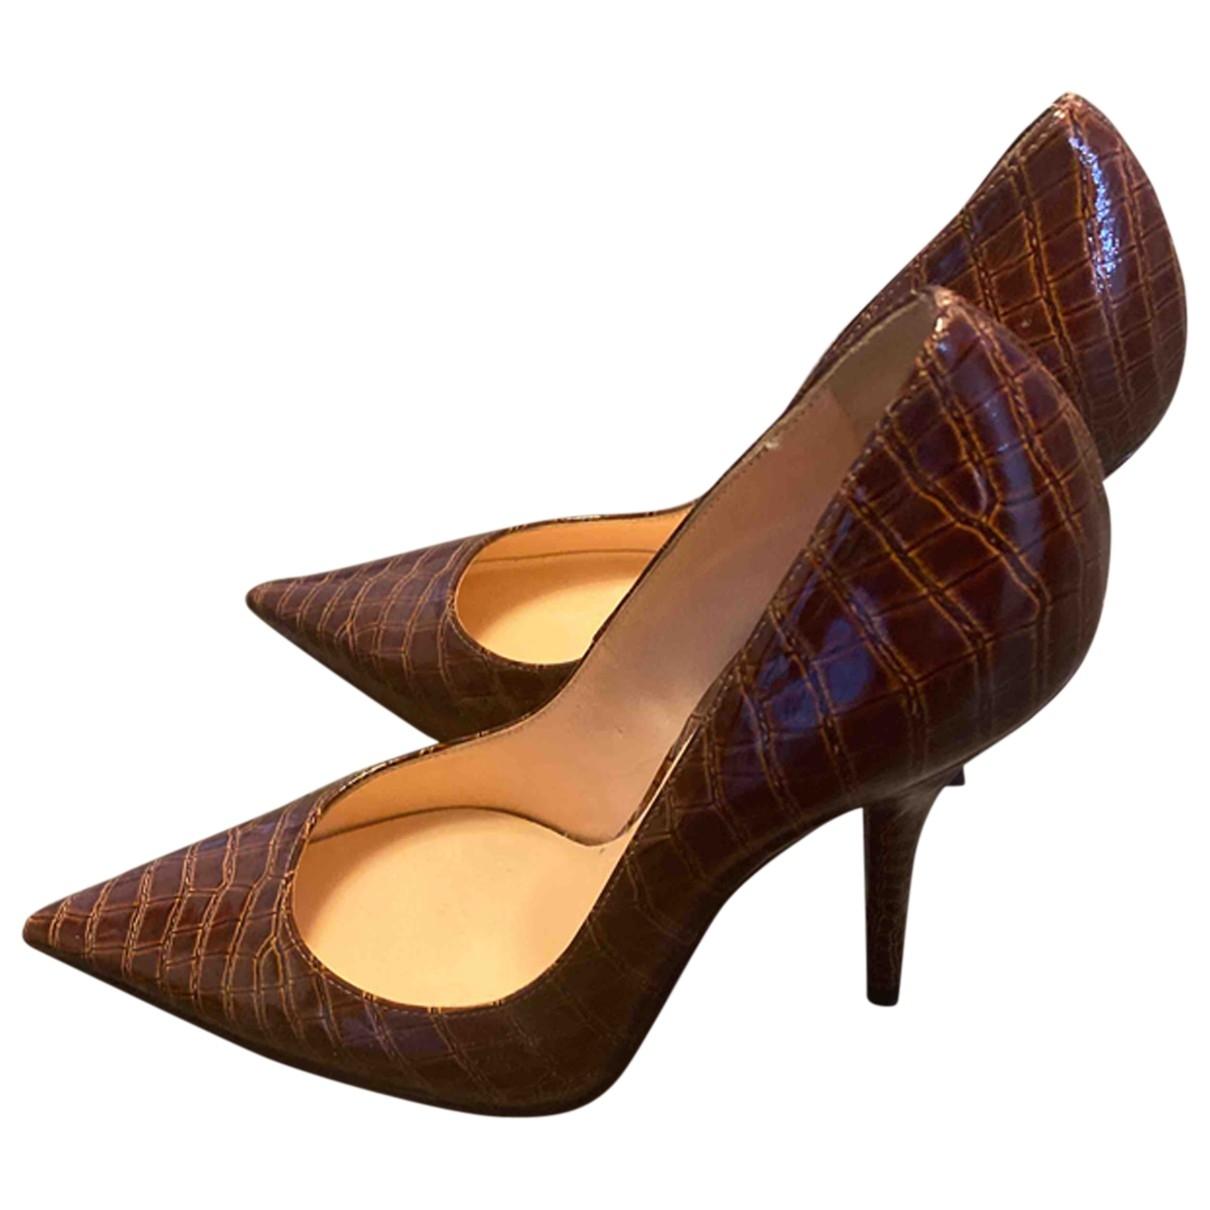 Casadei - Escarpins   pour femme en cuir - marron